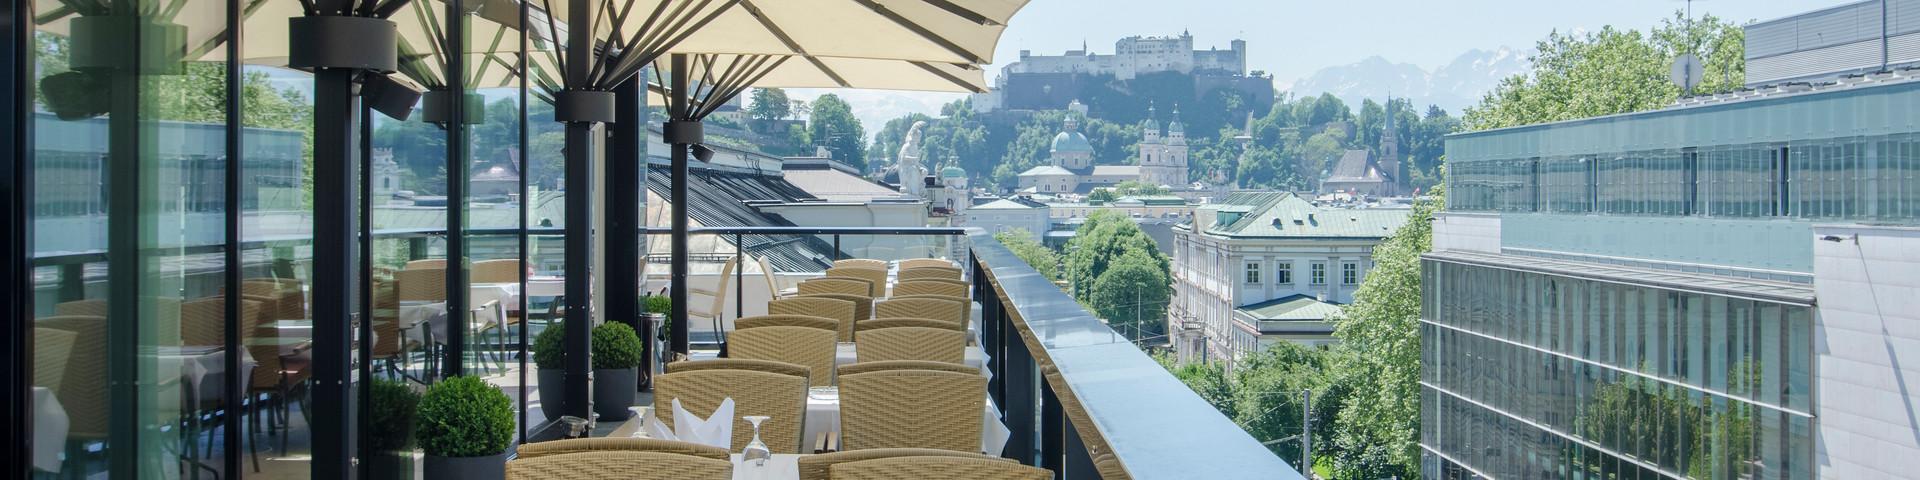 IMLAUER Sky - Bar © Imlauer Hotels & Restaurants